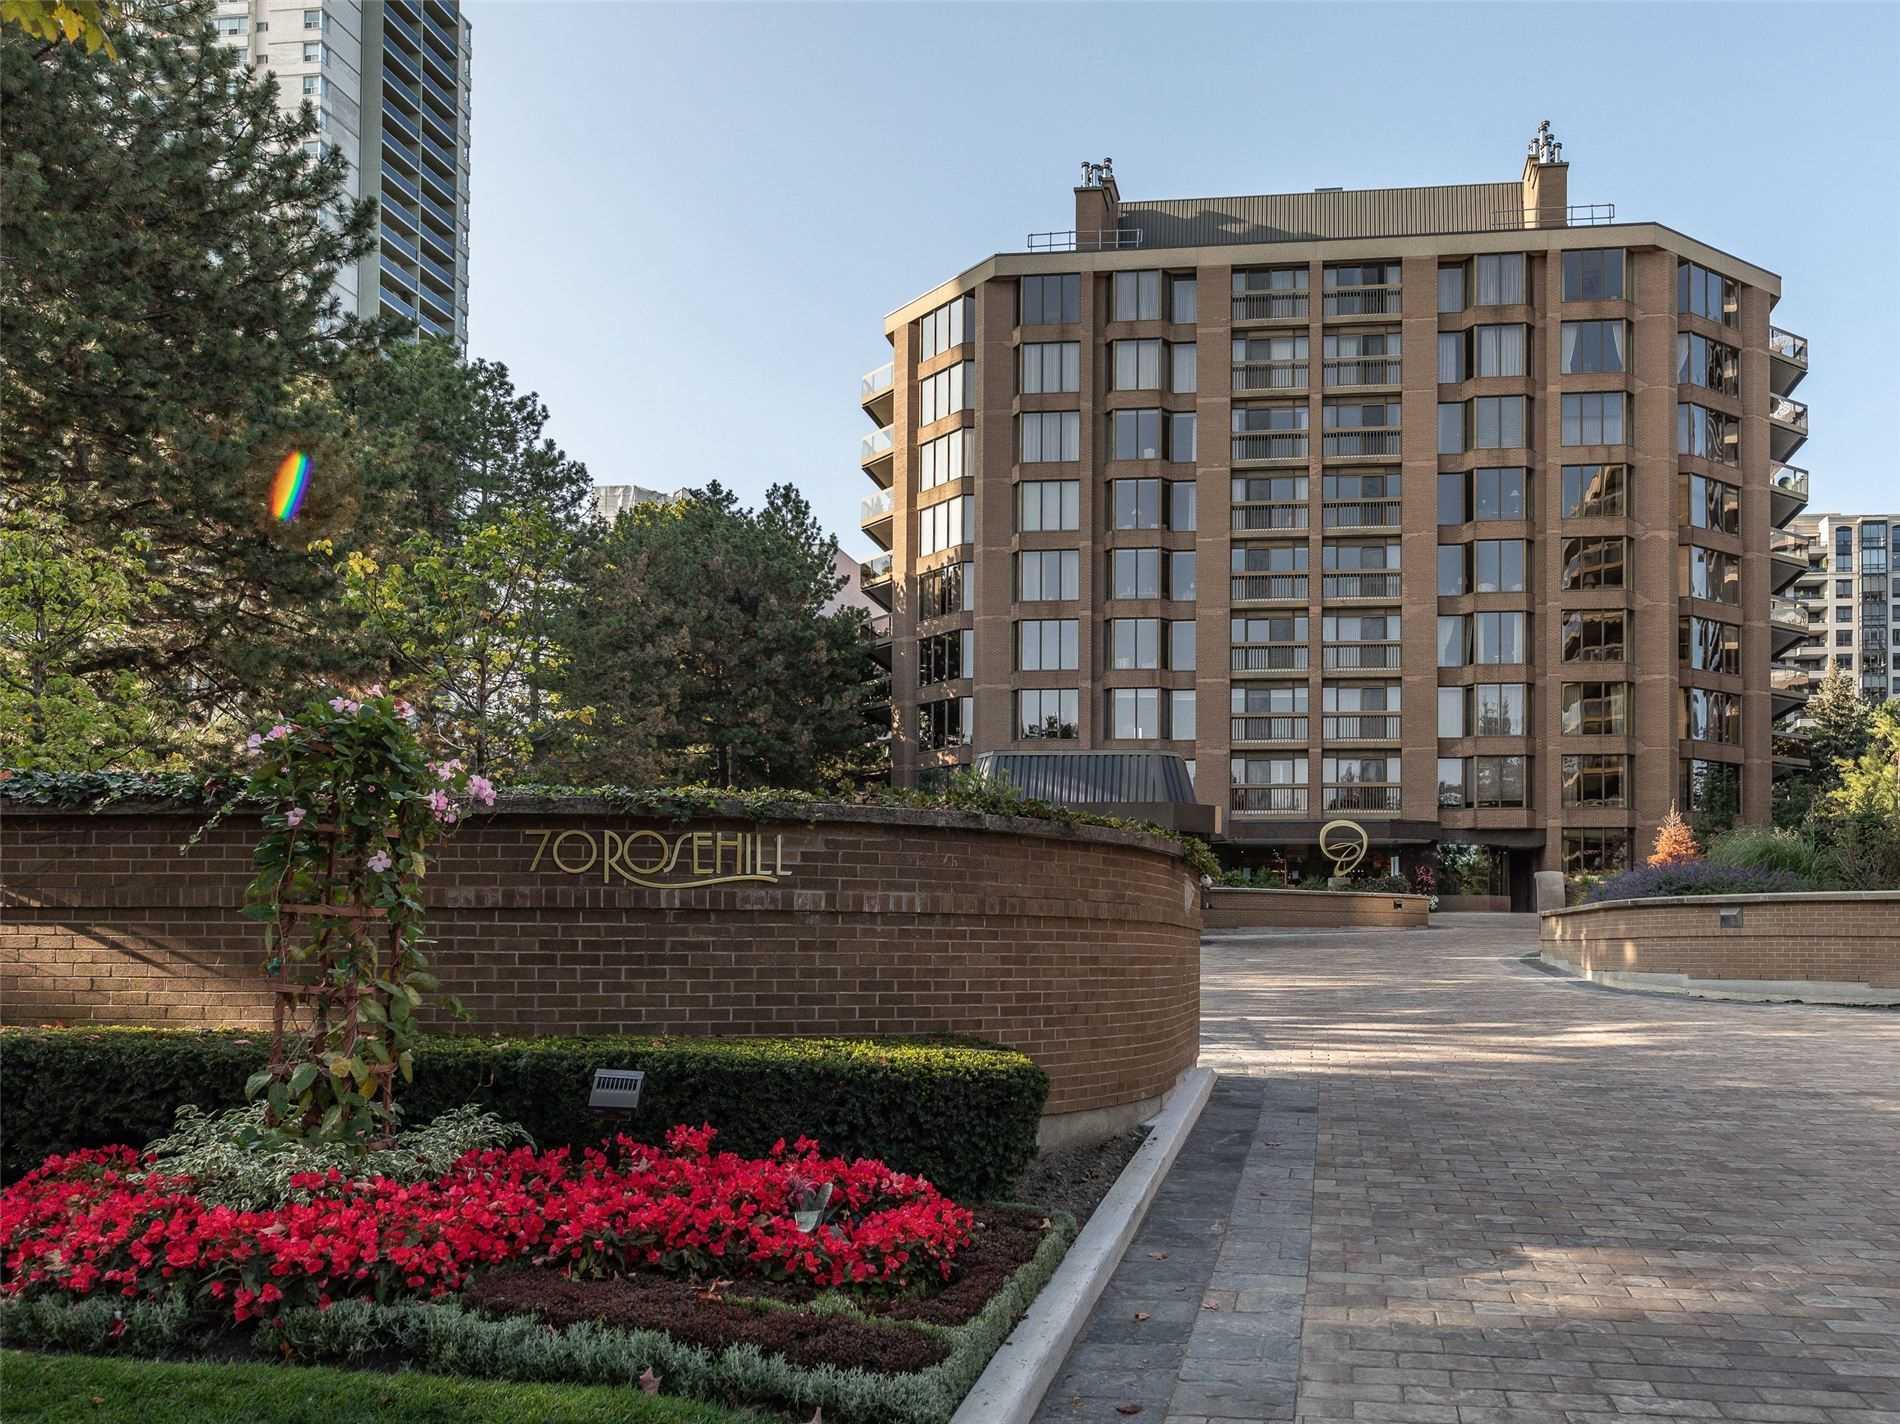 706 - 70 Rosehill Ave, Toronto, M4T2W7